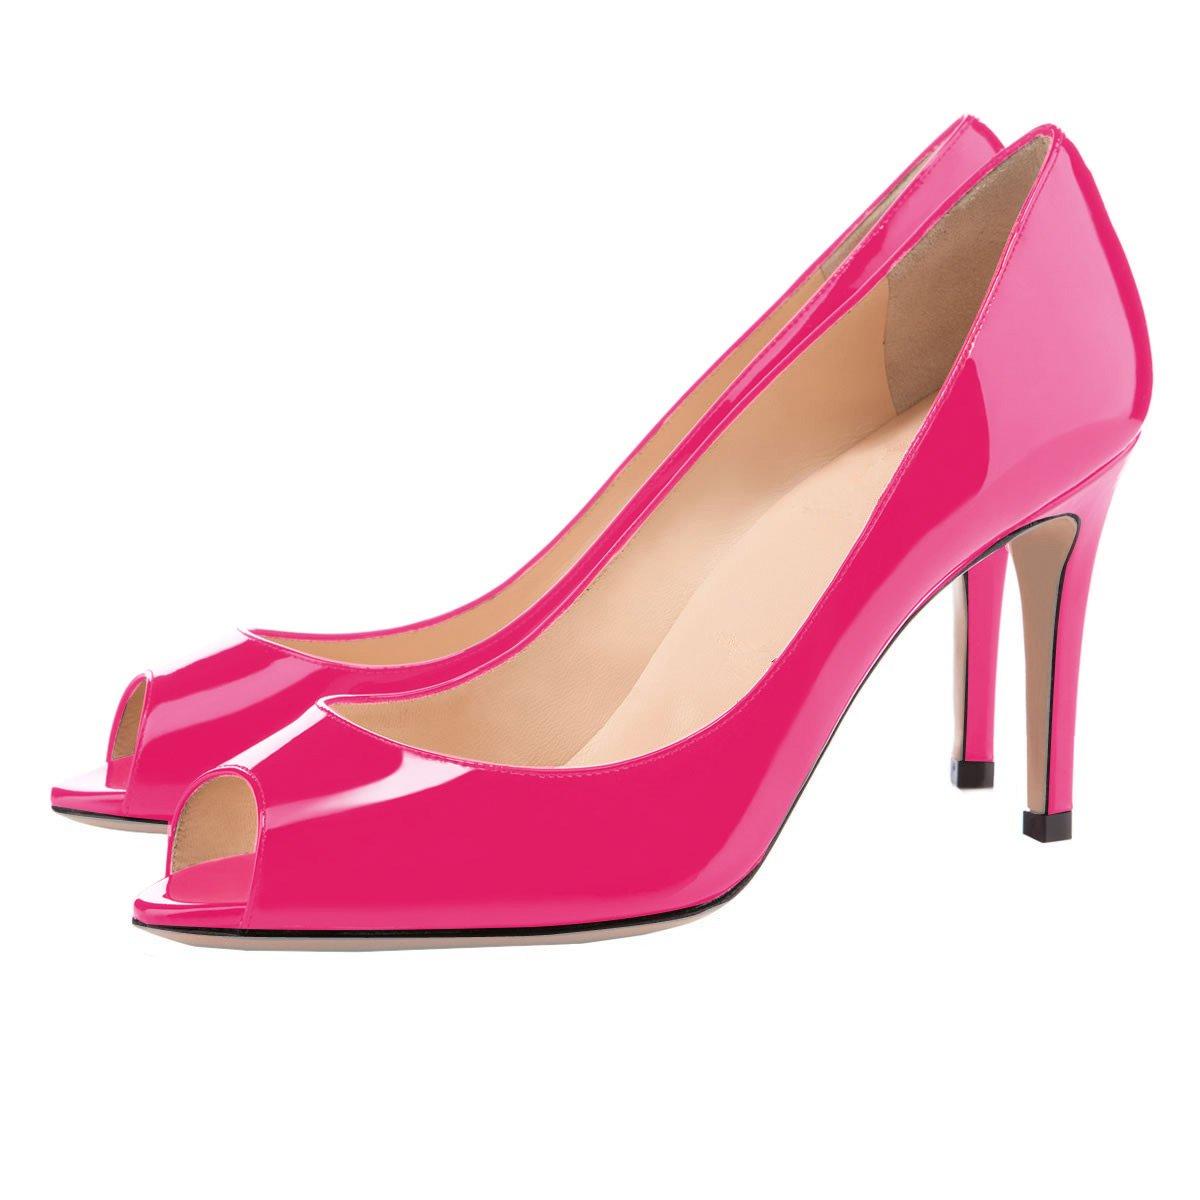 Eldof Women Peep Toe Pumps Mid-Heel Pumps Formal Wedding Bridal Classic Heel Open Toe Stiletto B07F1QGHKB 13 B(M) US|Rose